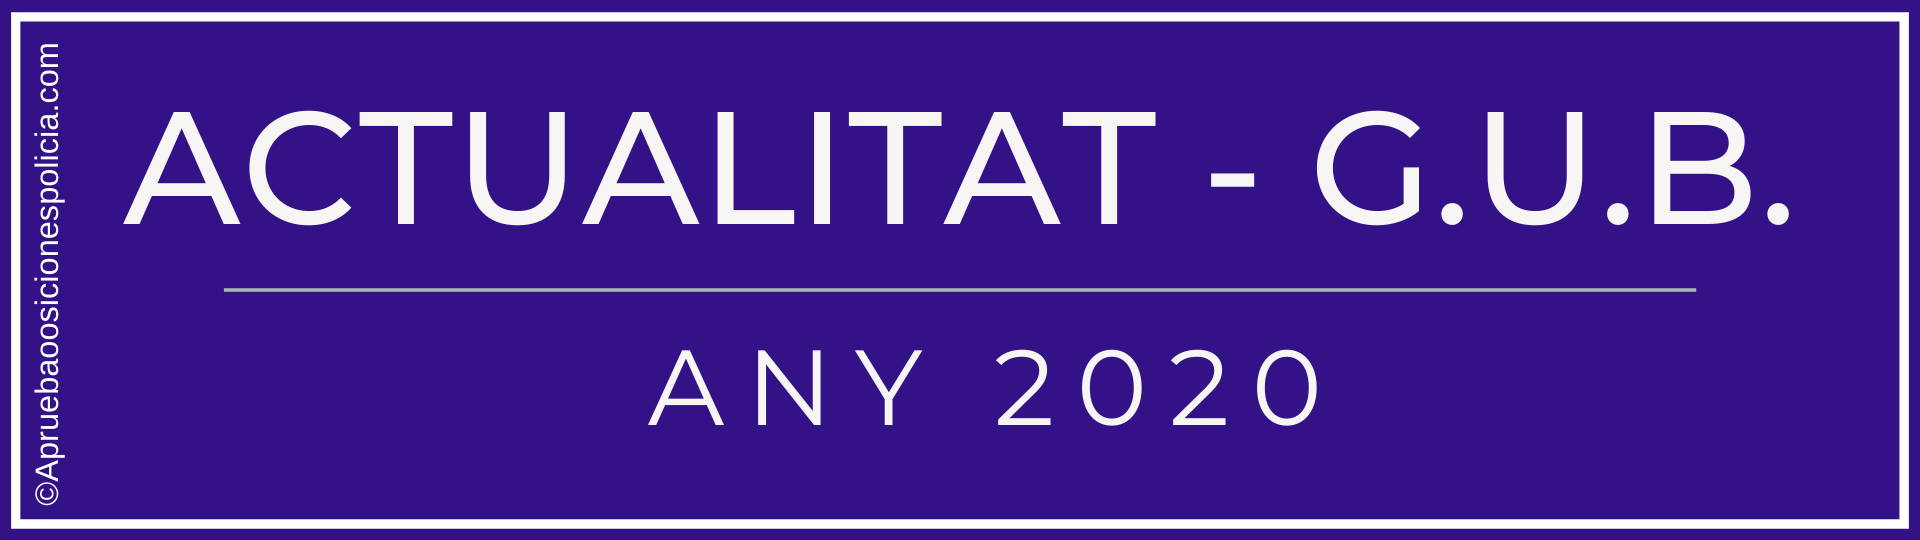 Actualidad Guardia Urbana Barcelona 2020